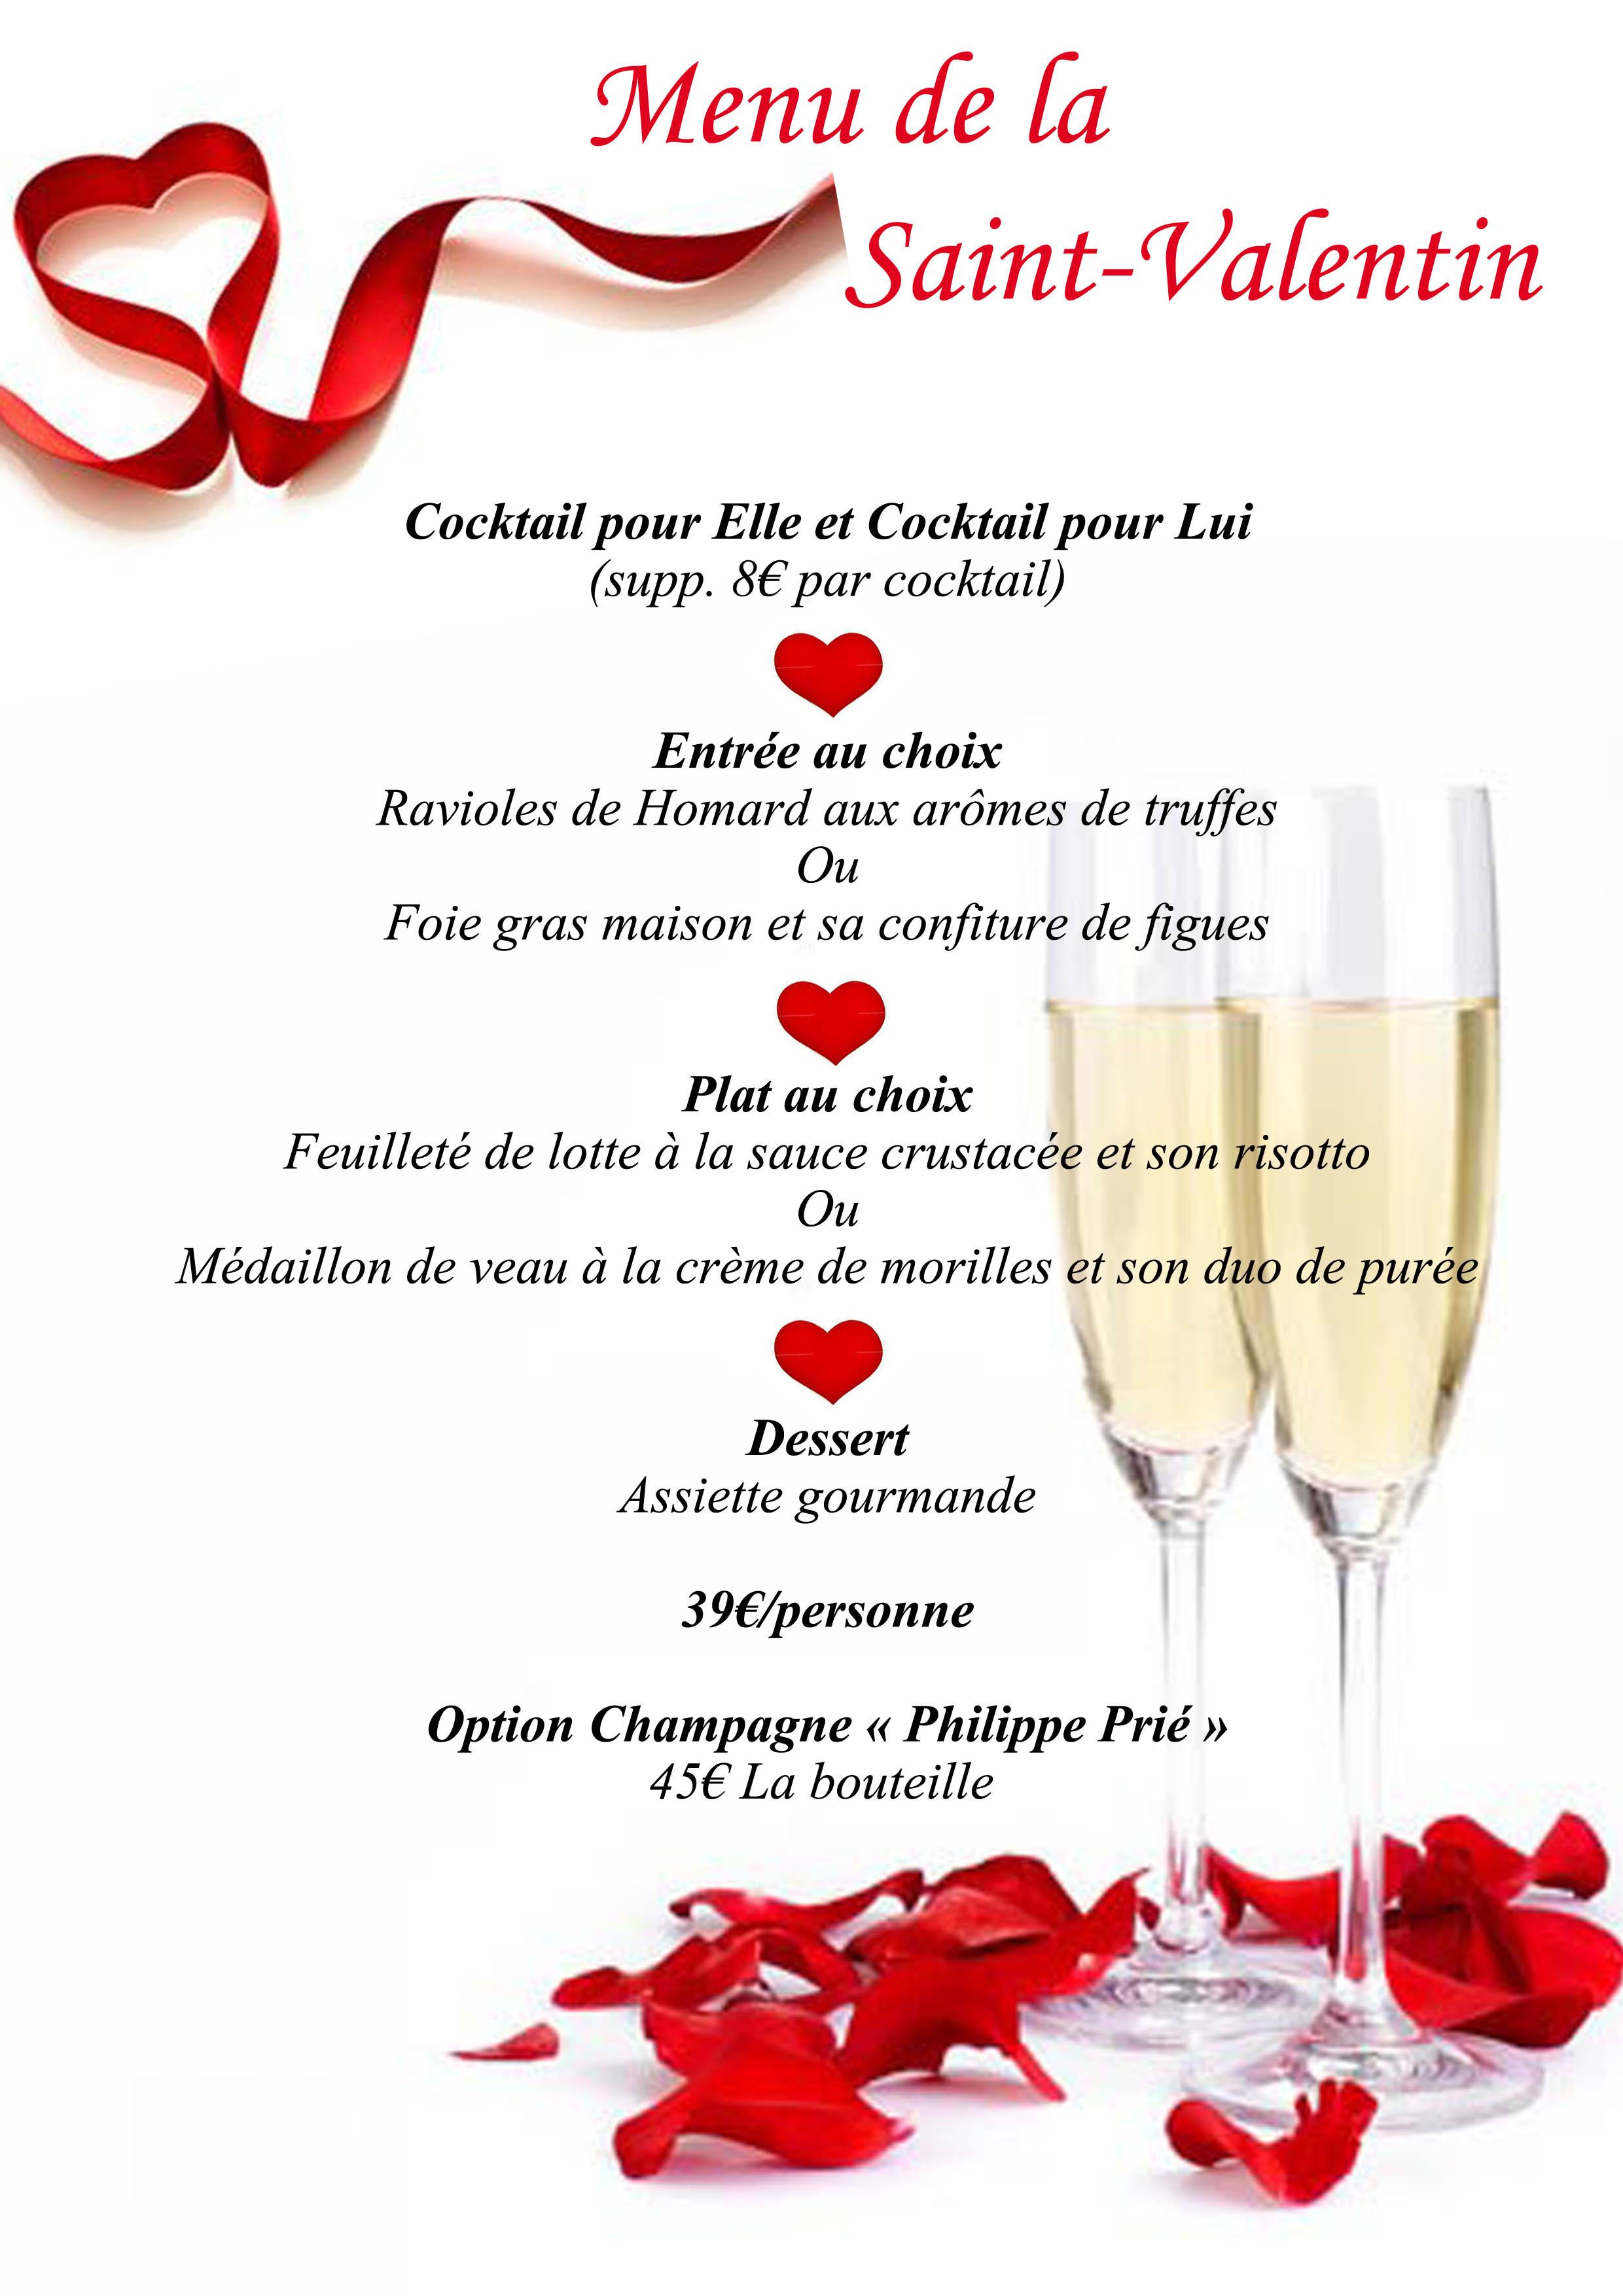 Menu de la Saint-Valentin au Mecano